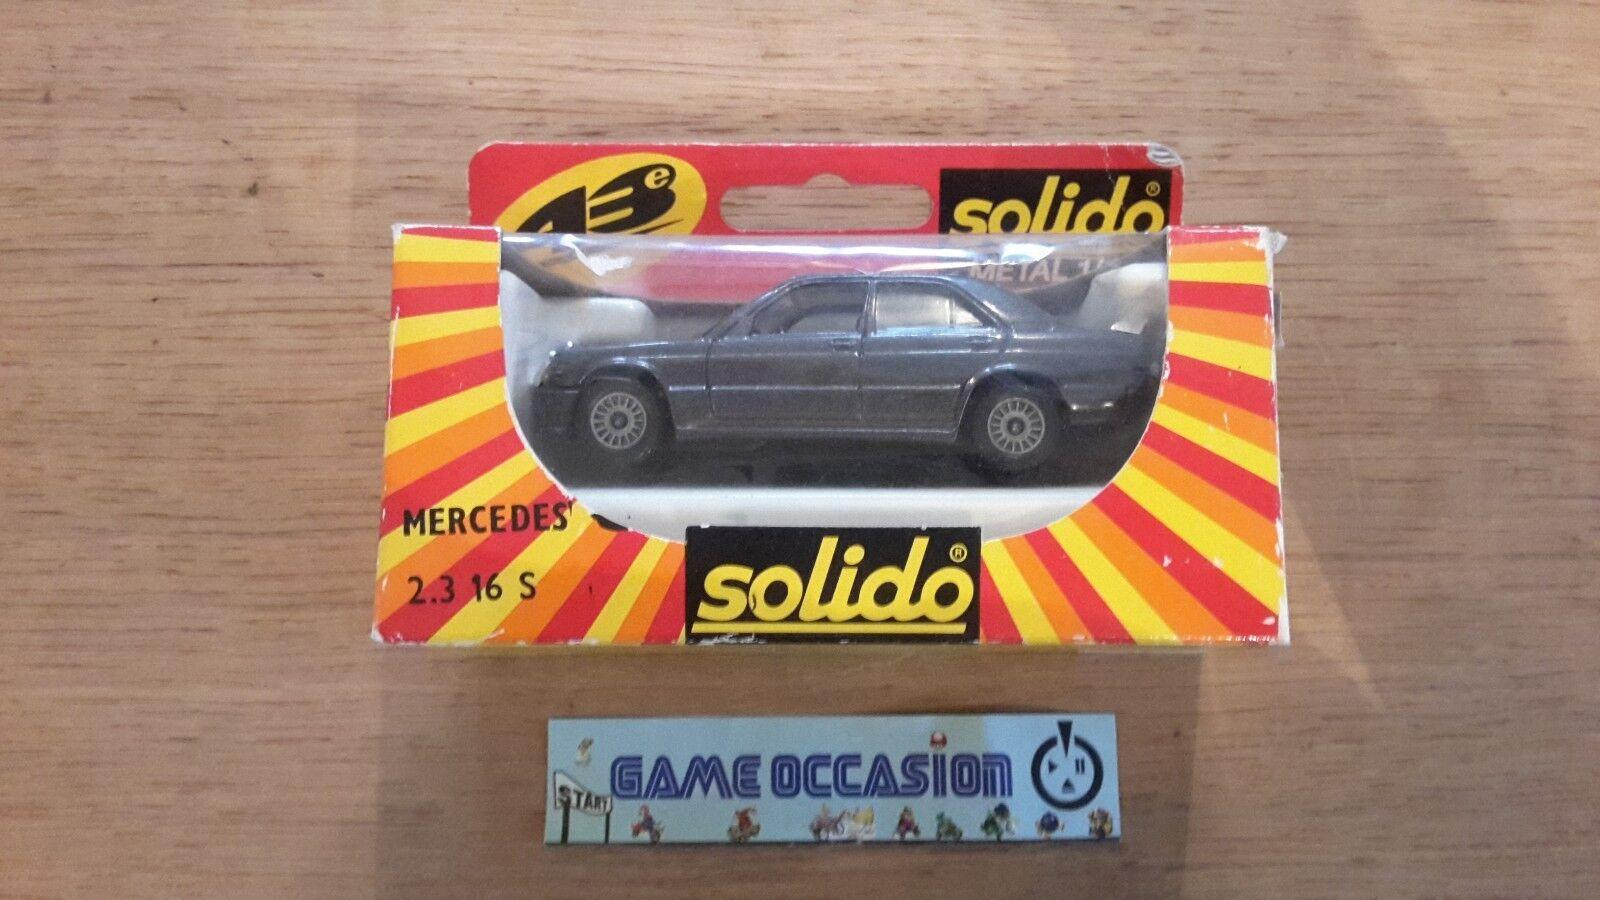 MERCEDES 2.3 16 S SOLIDO METAL 1 43   CAR CAR VINTAGE TOY OLD METAL